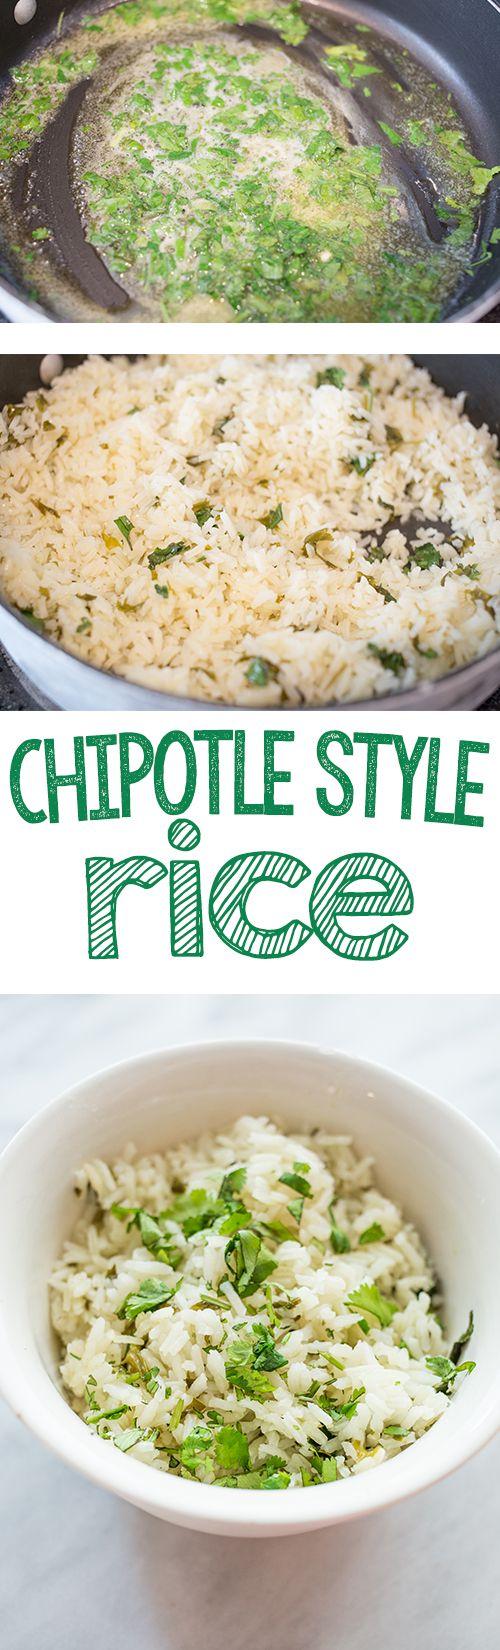 Chipotle Knockoff Cilantro Lime Rice